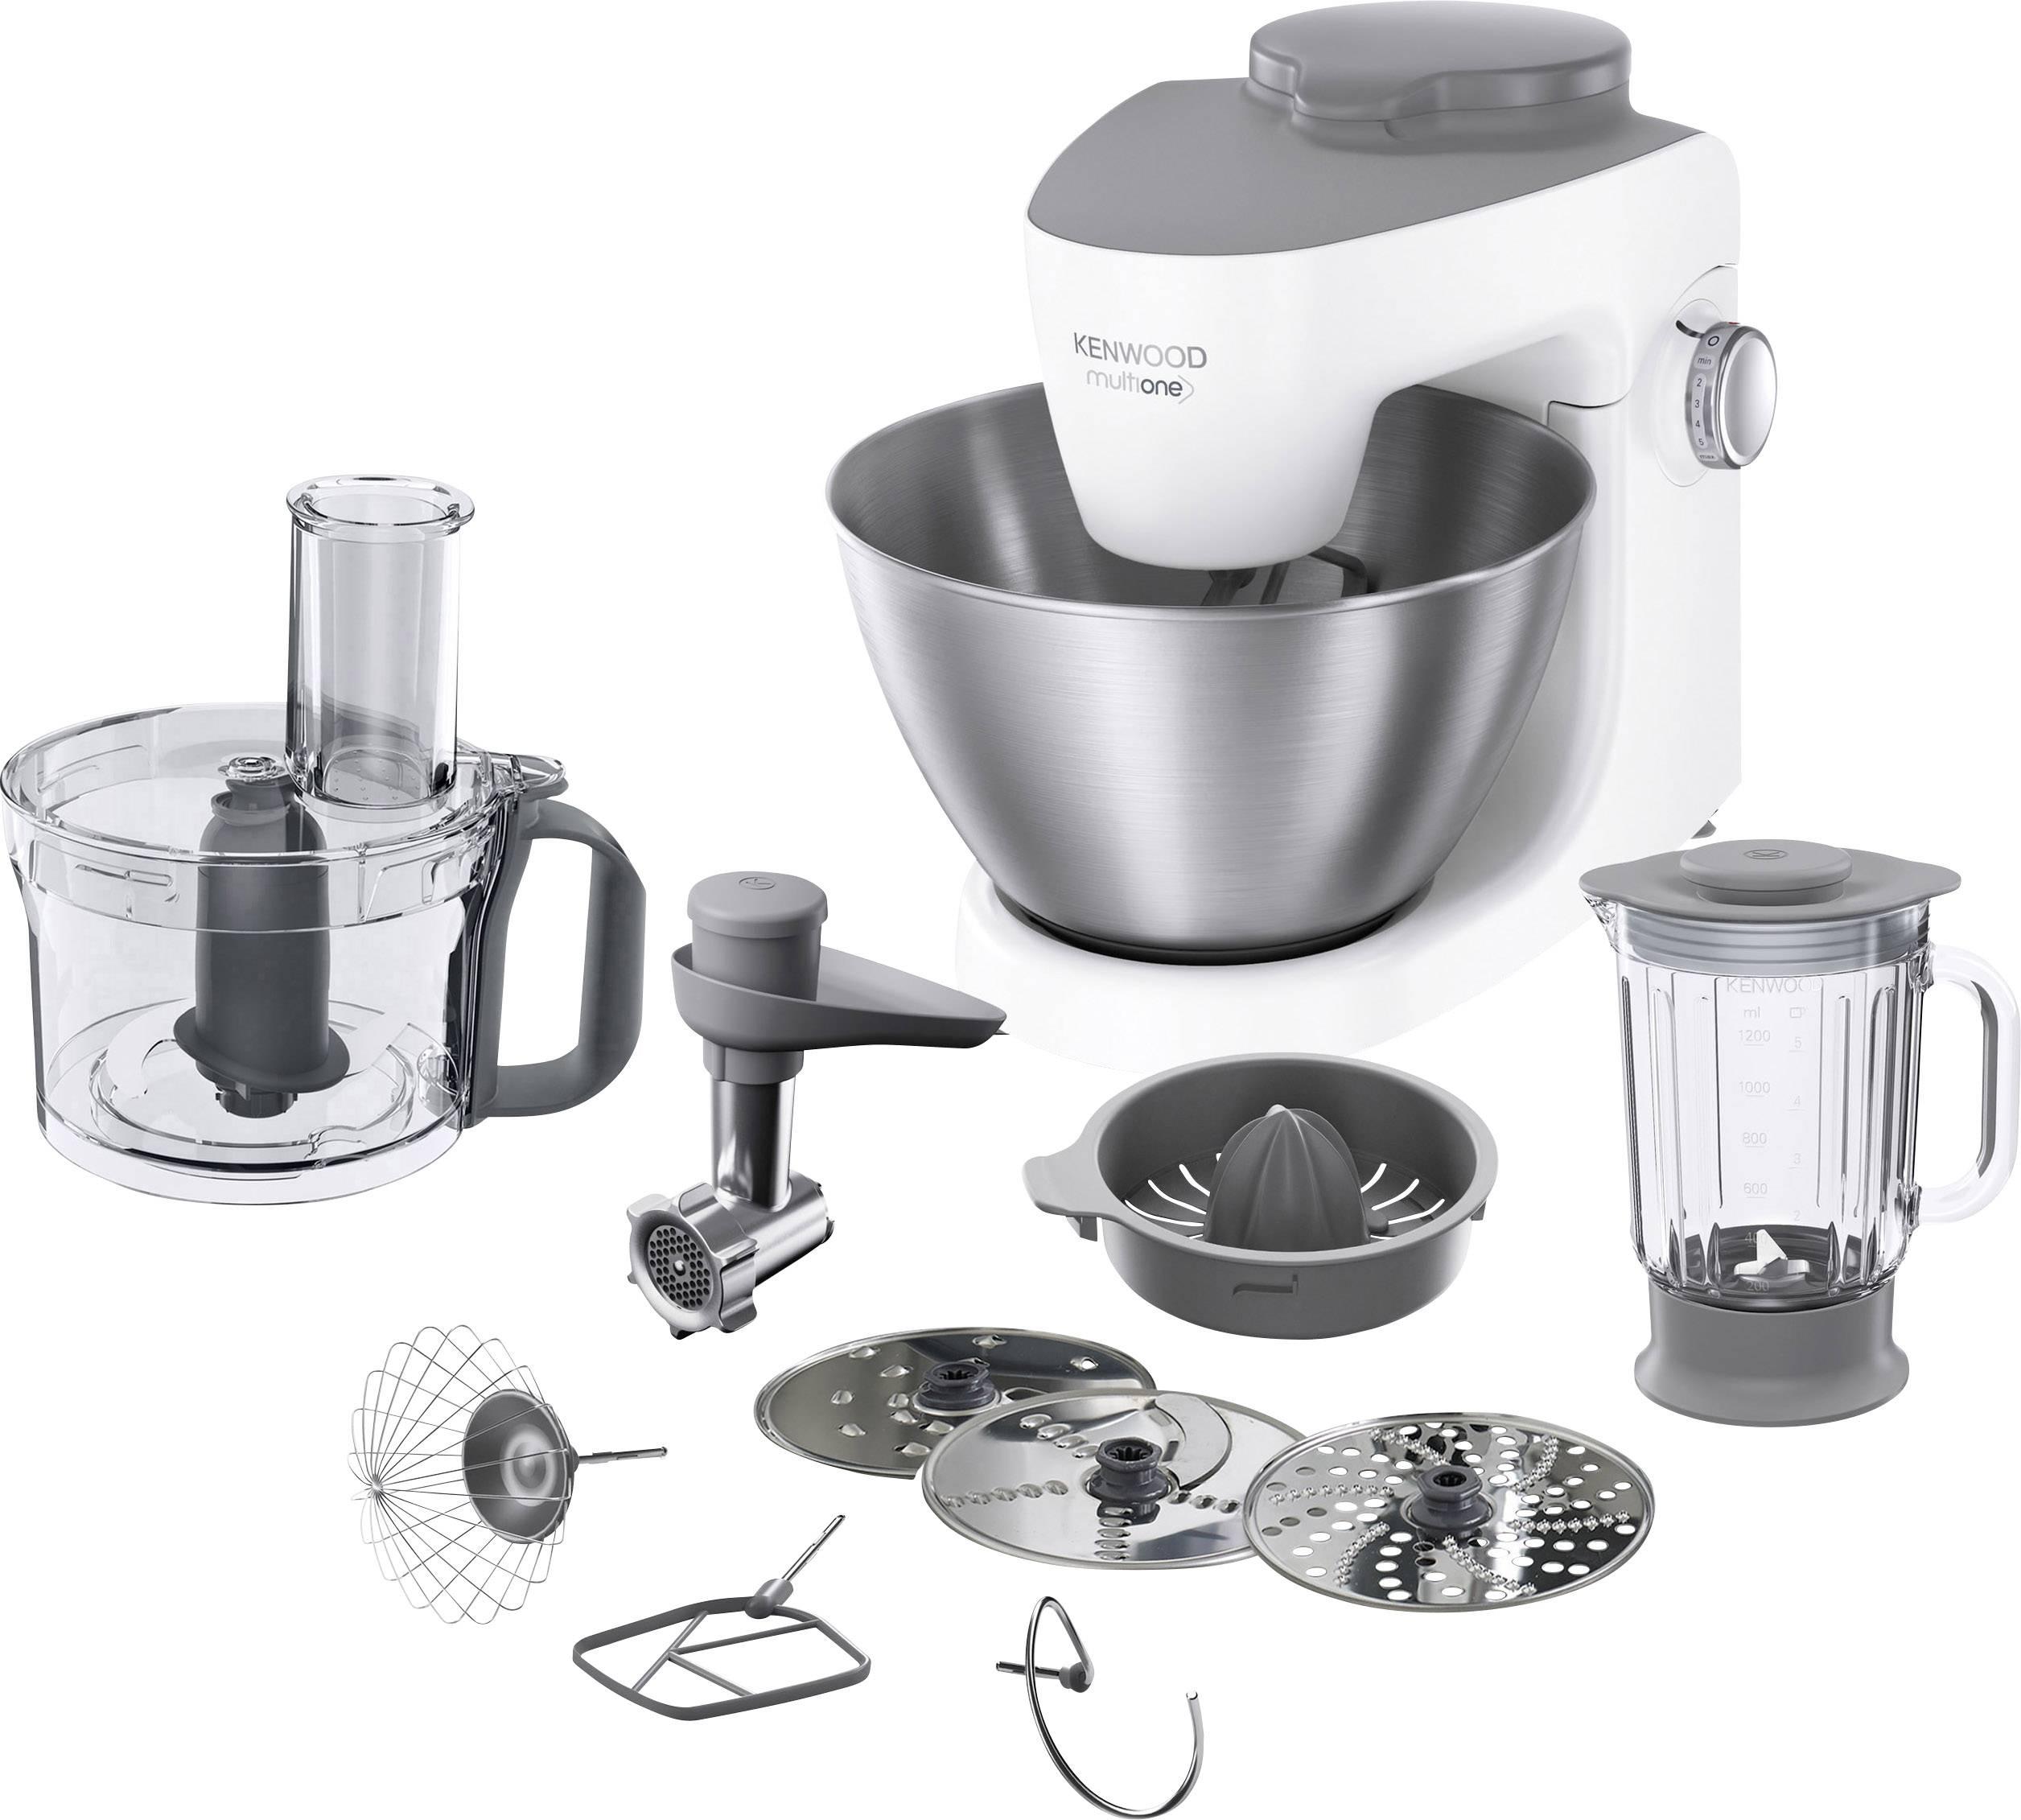 Kenwood Home Appliance KHH323 WH Robot da cucina 1000 W Bianco, Acciaio